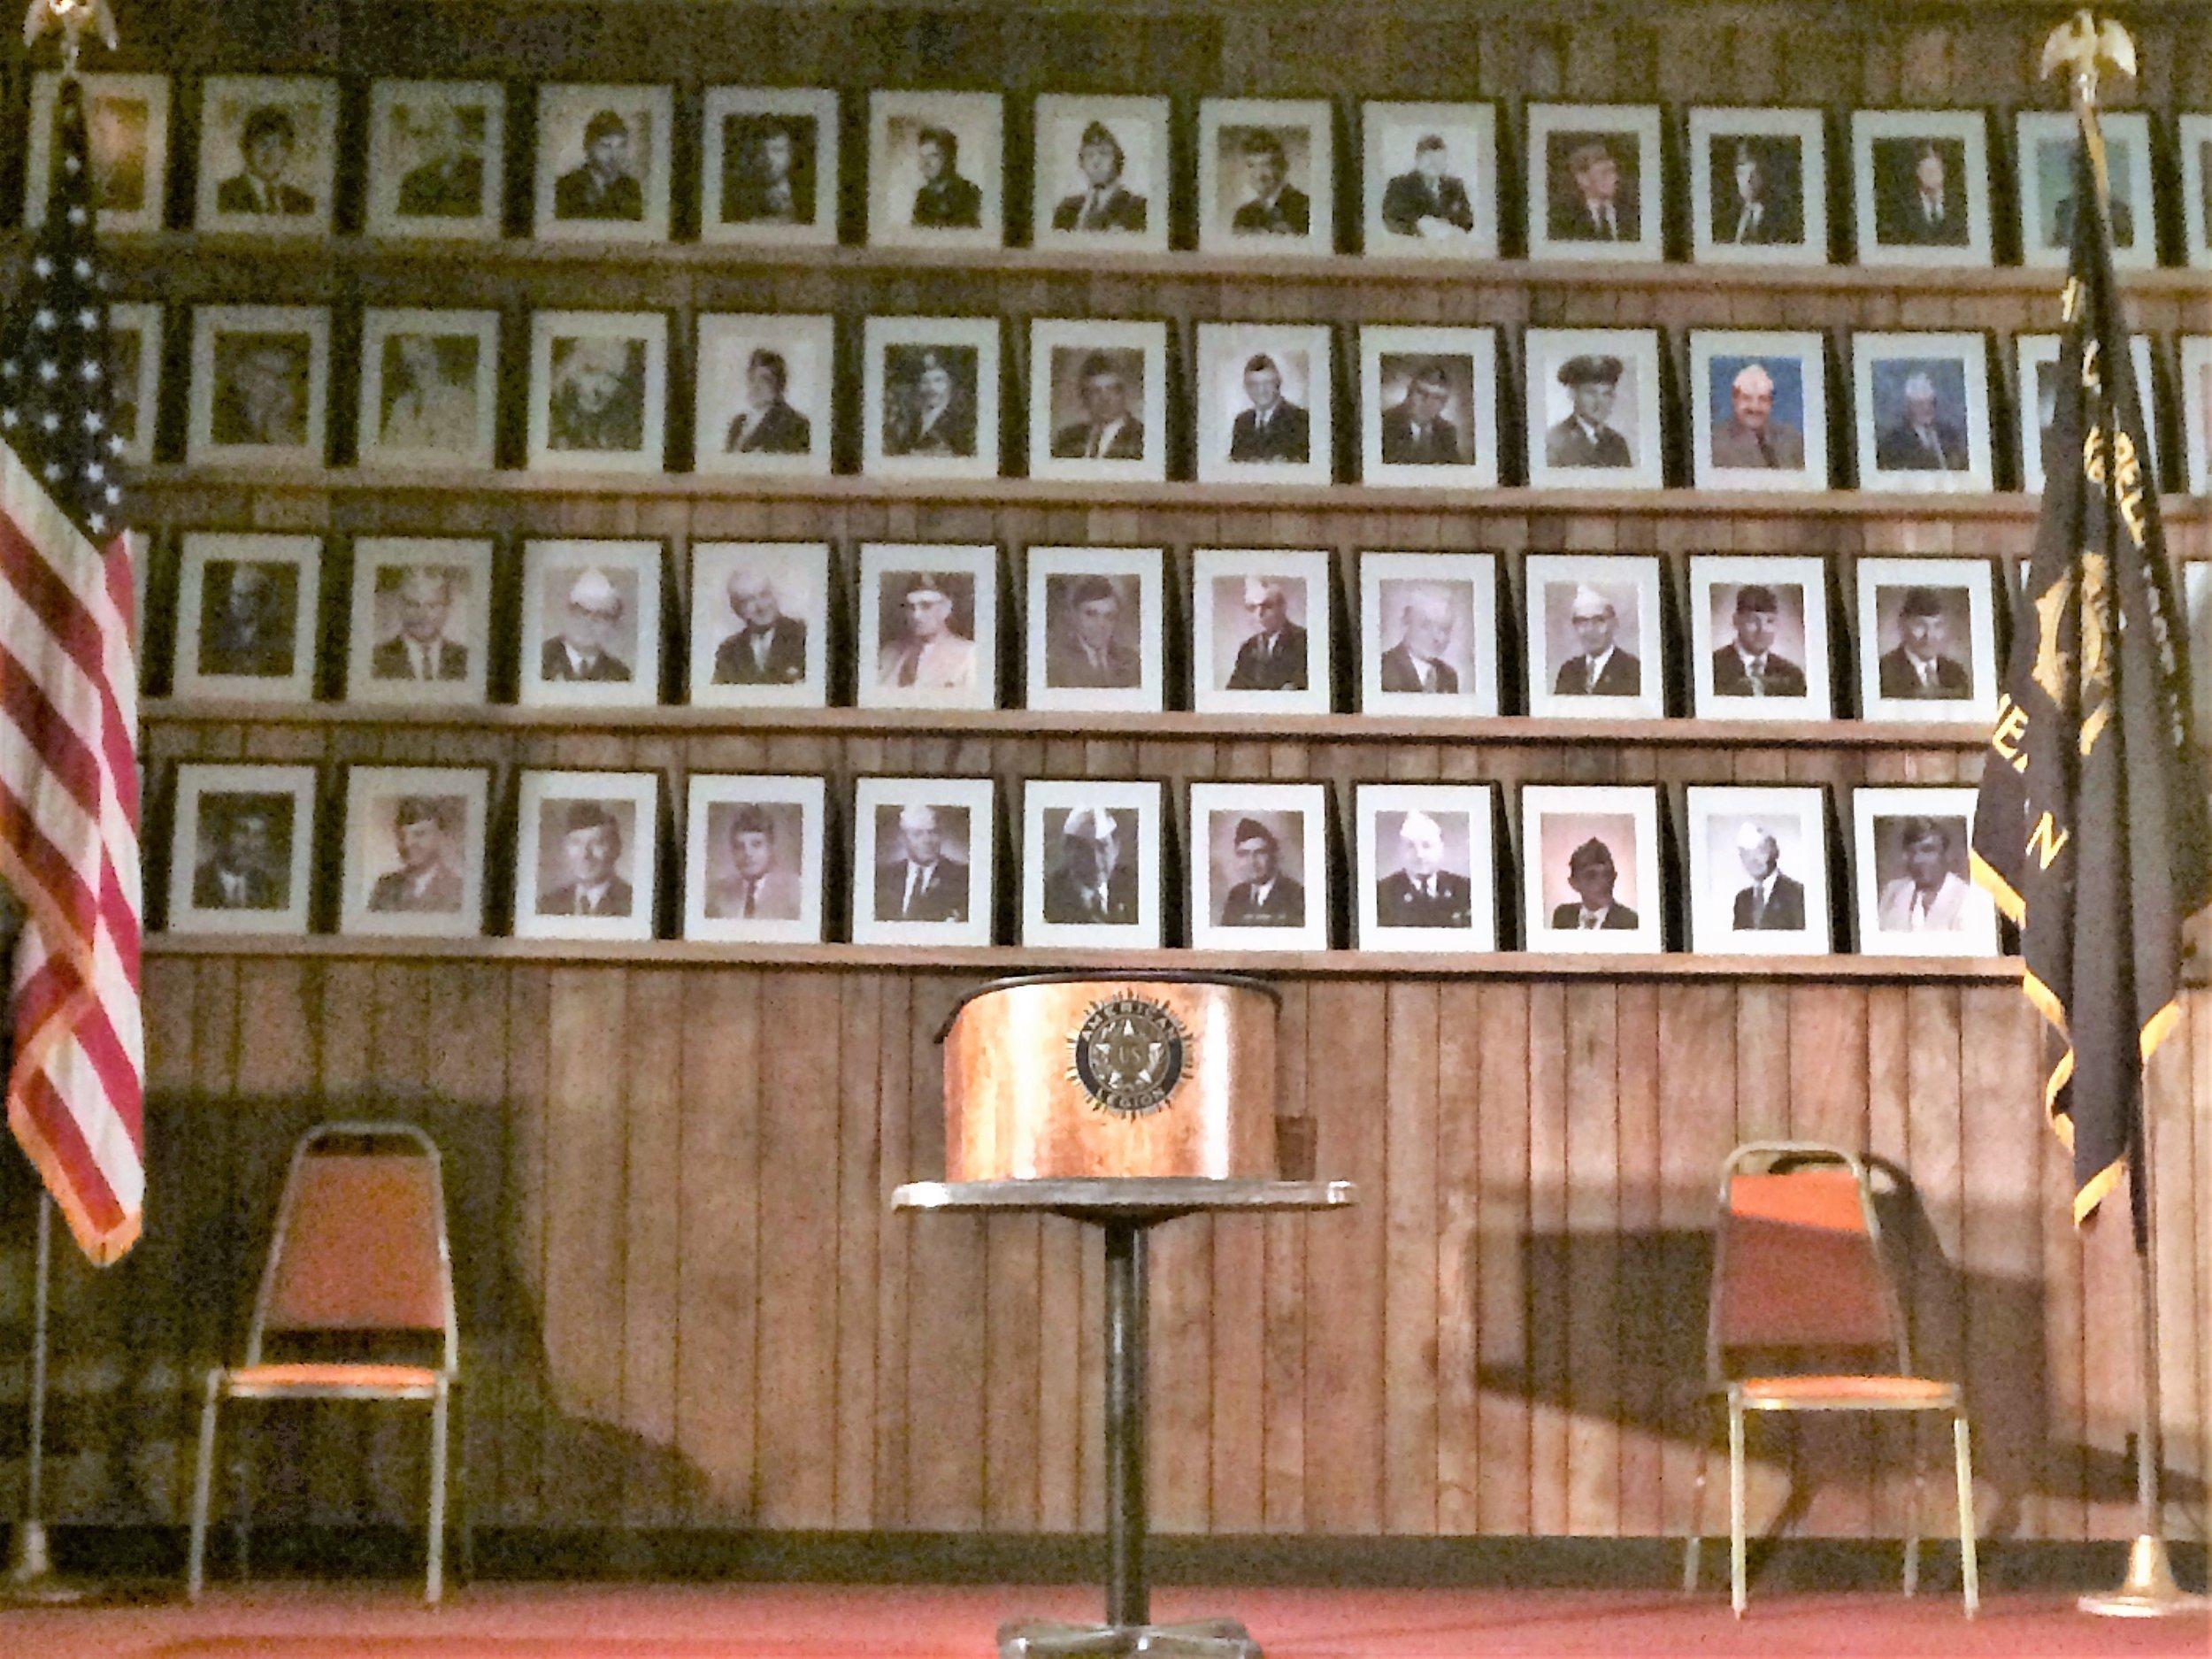 The setting: An American Legion Hall